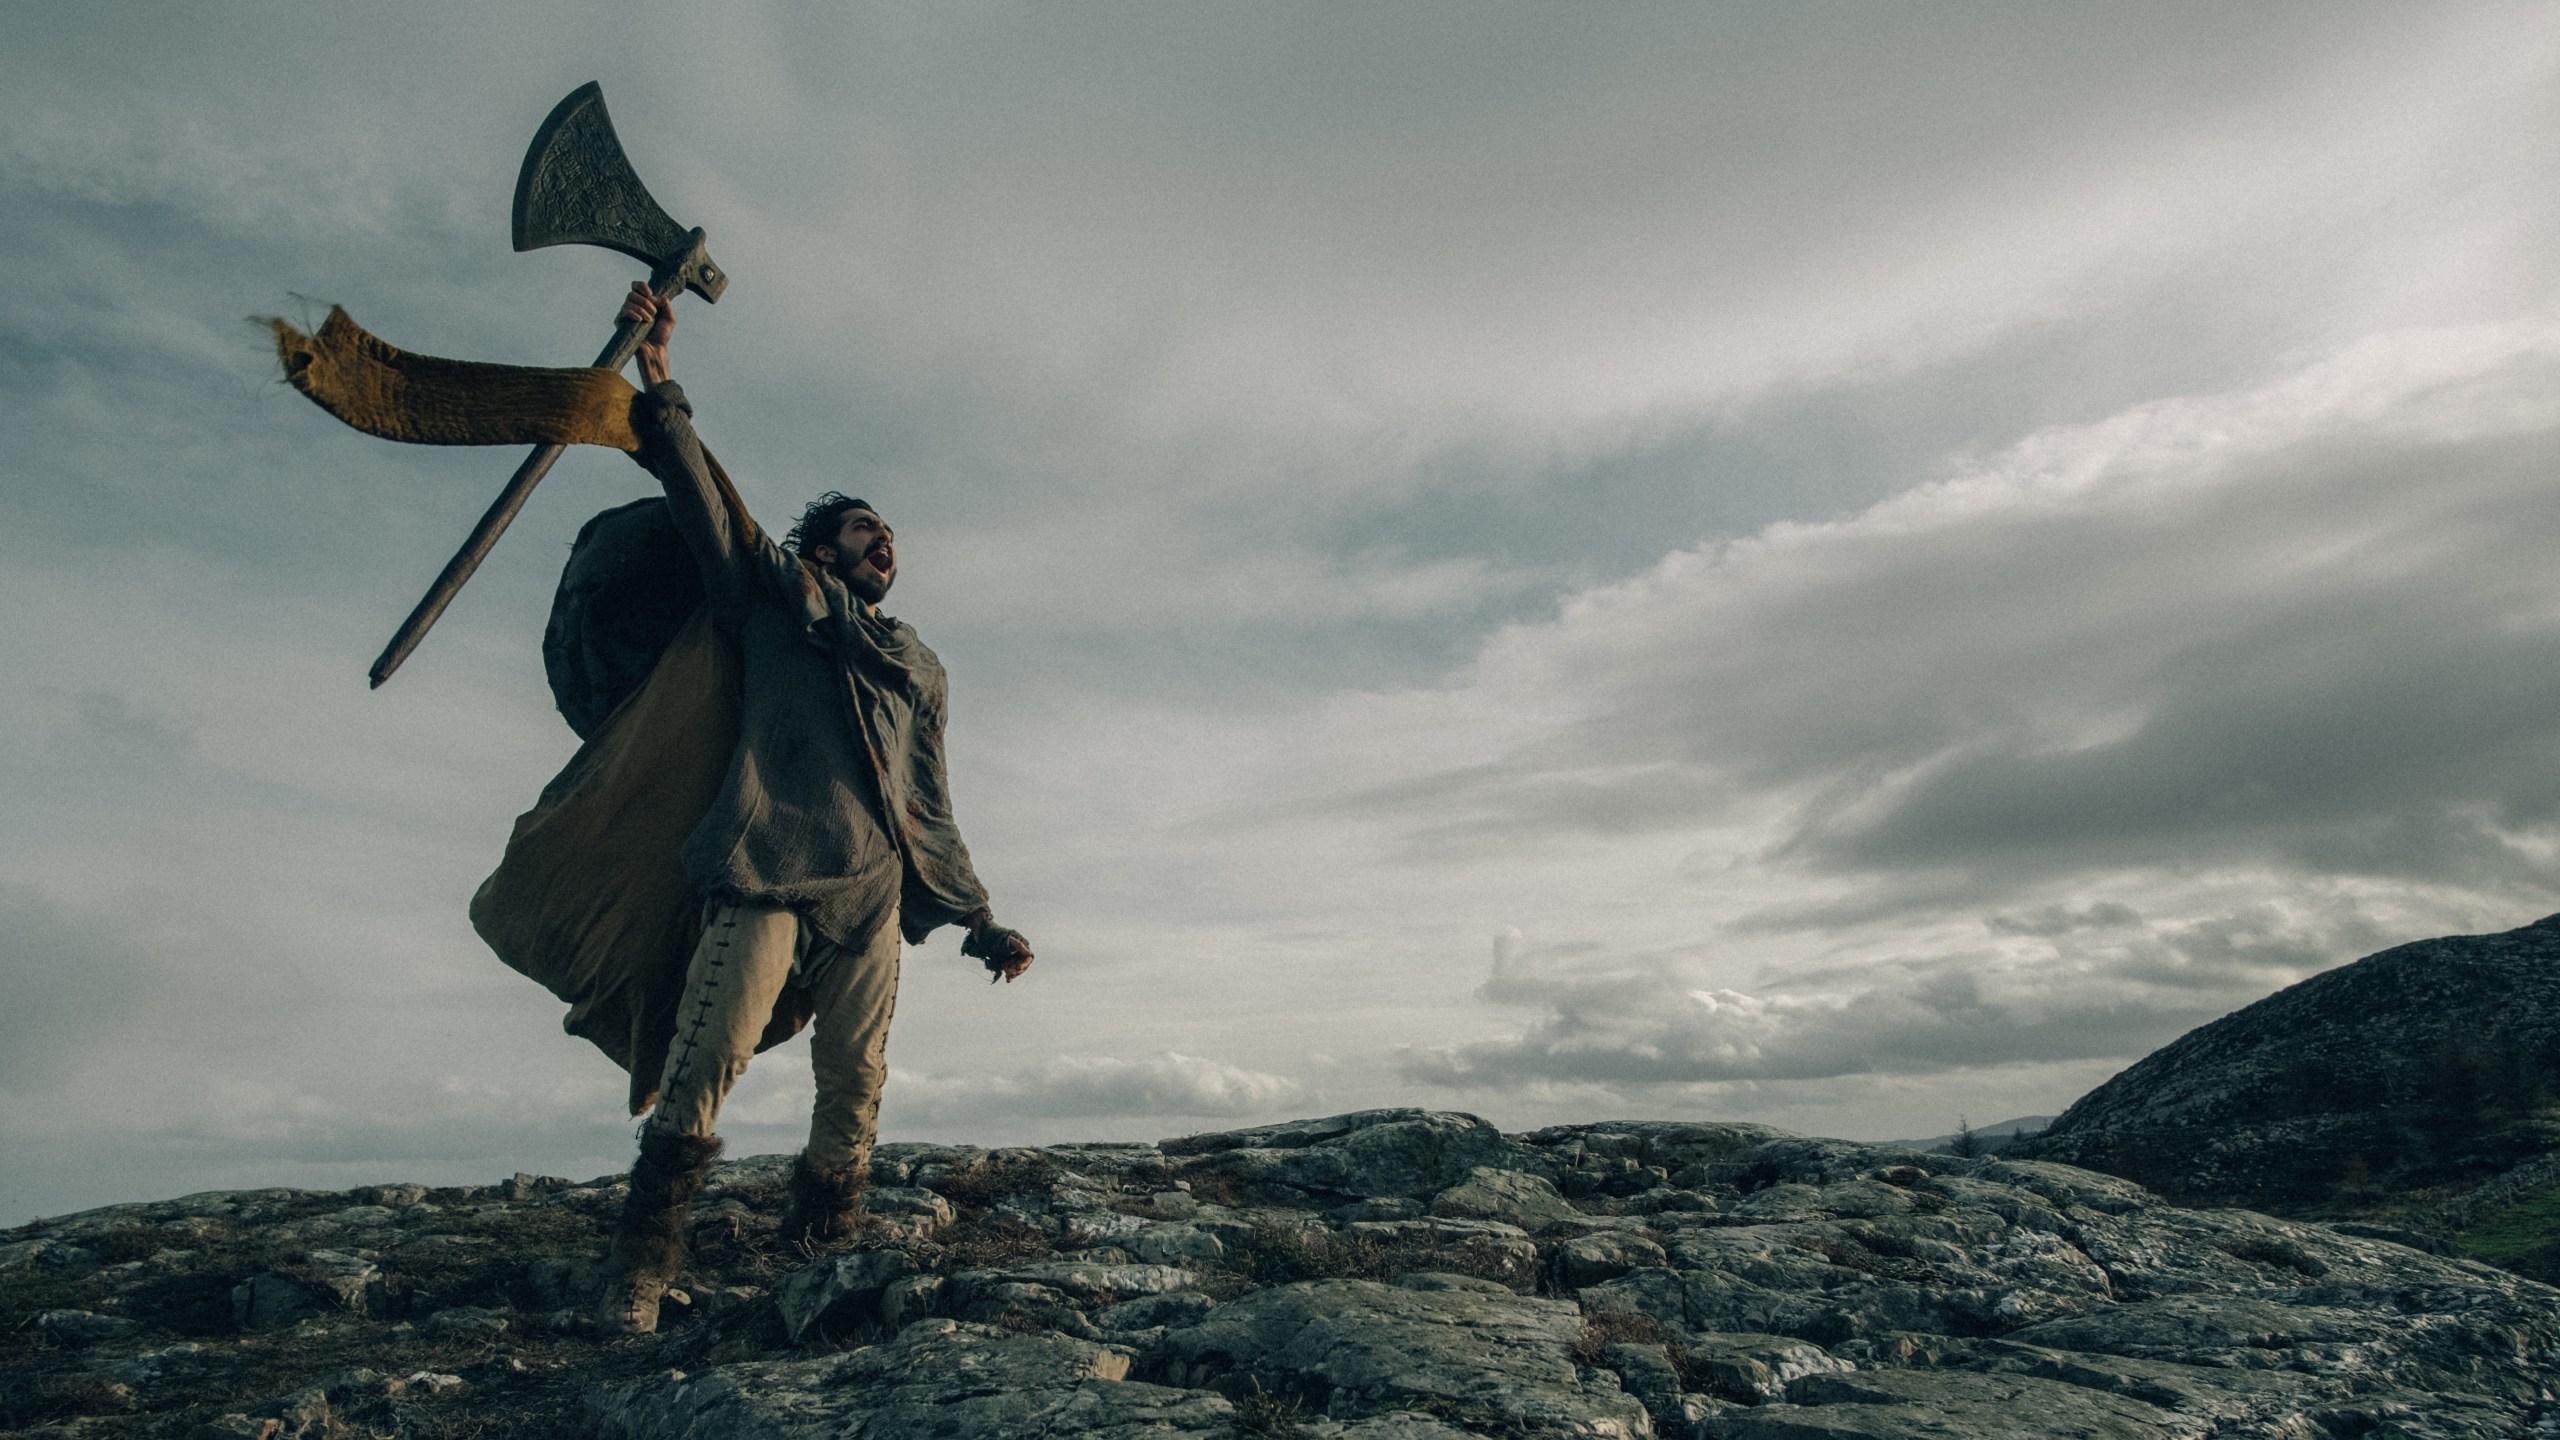 Dev Patel as Sir Gawain in The Green Knight (A24)